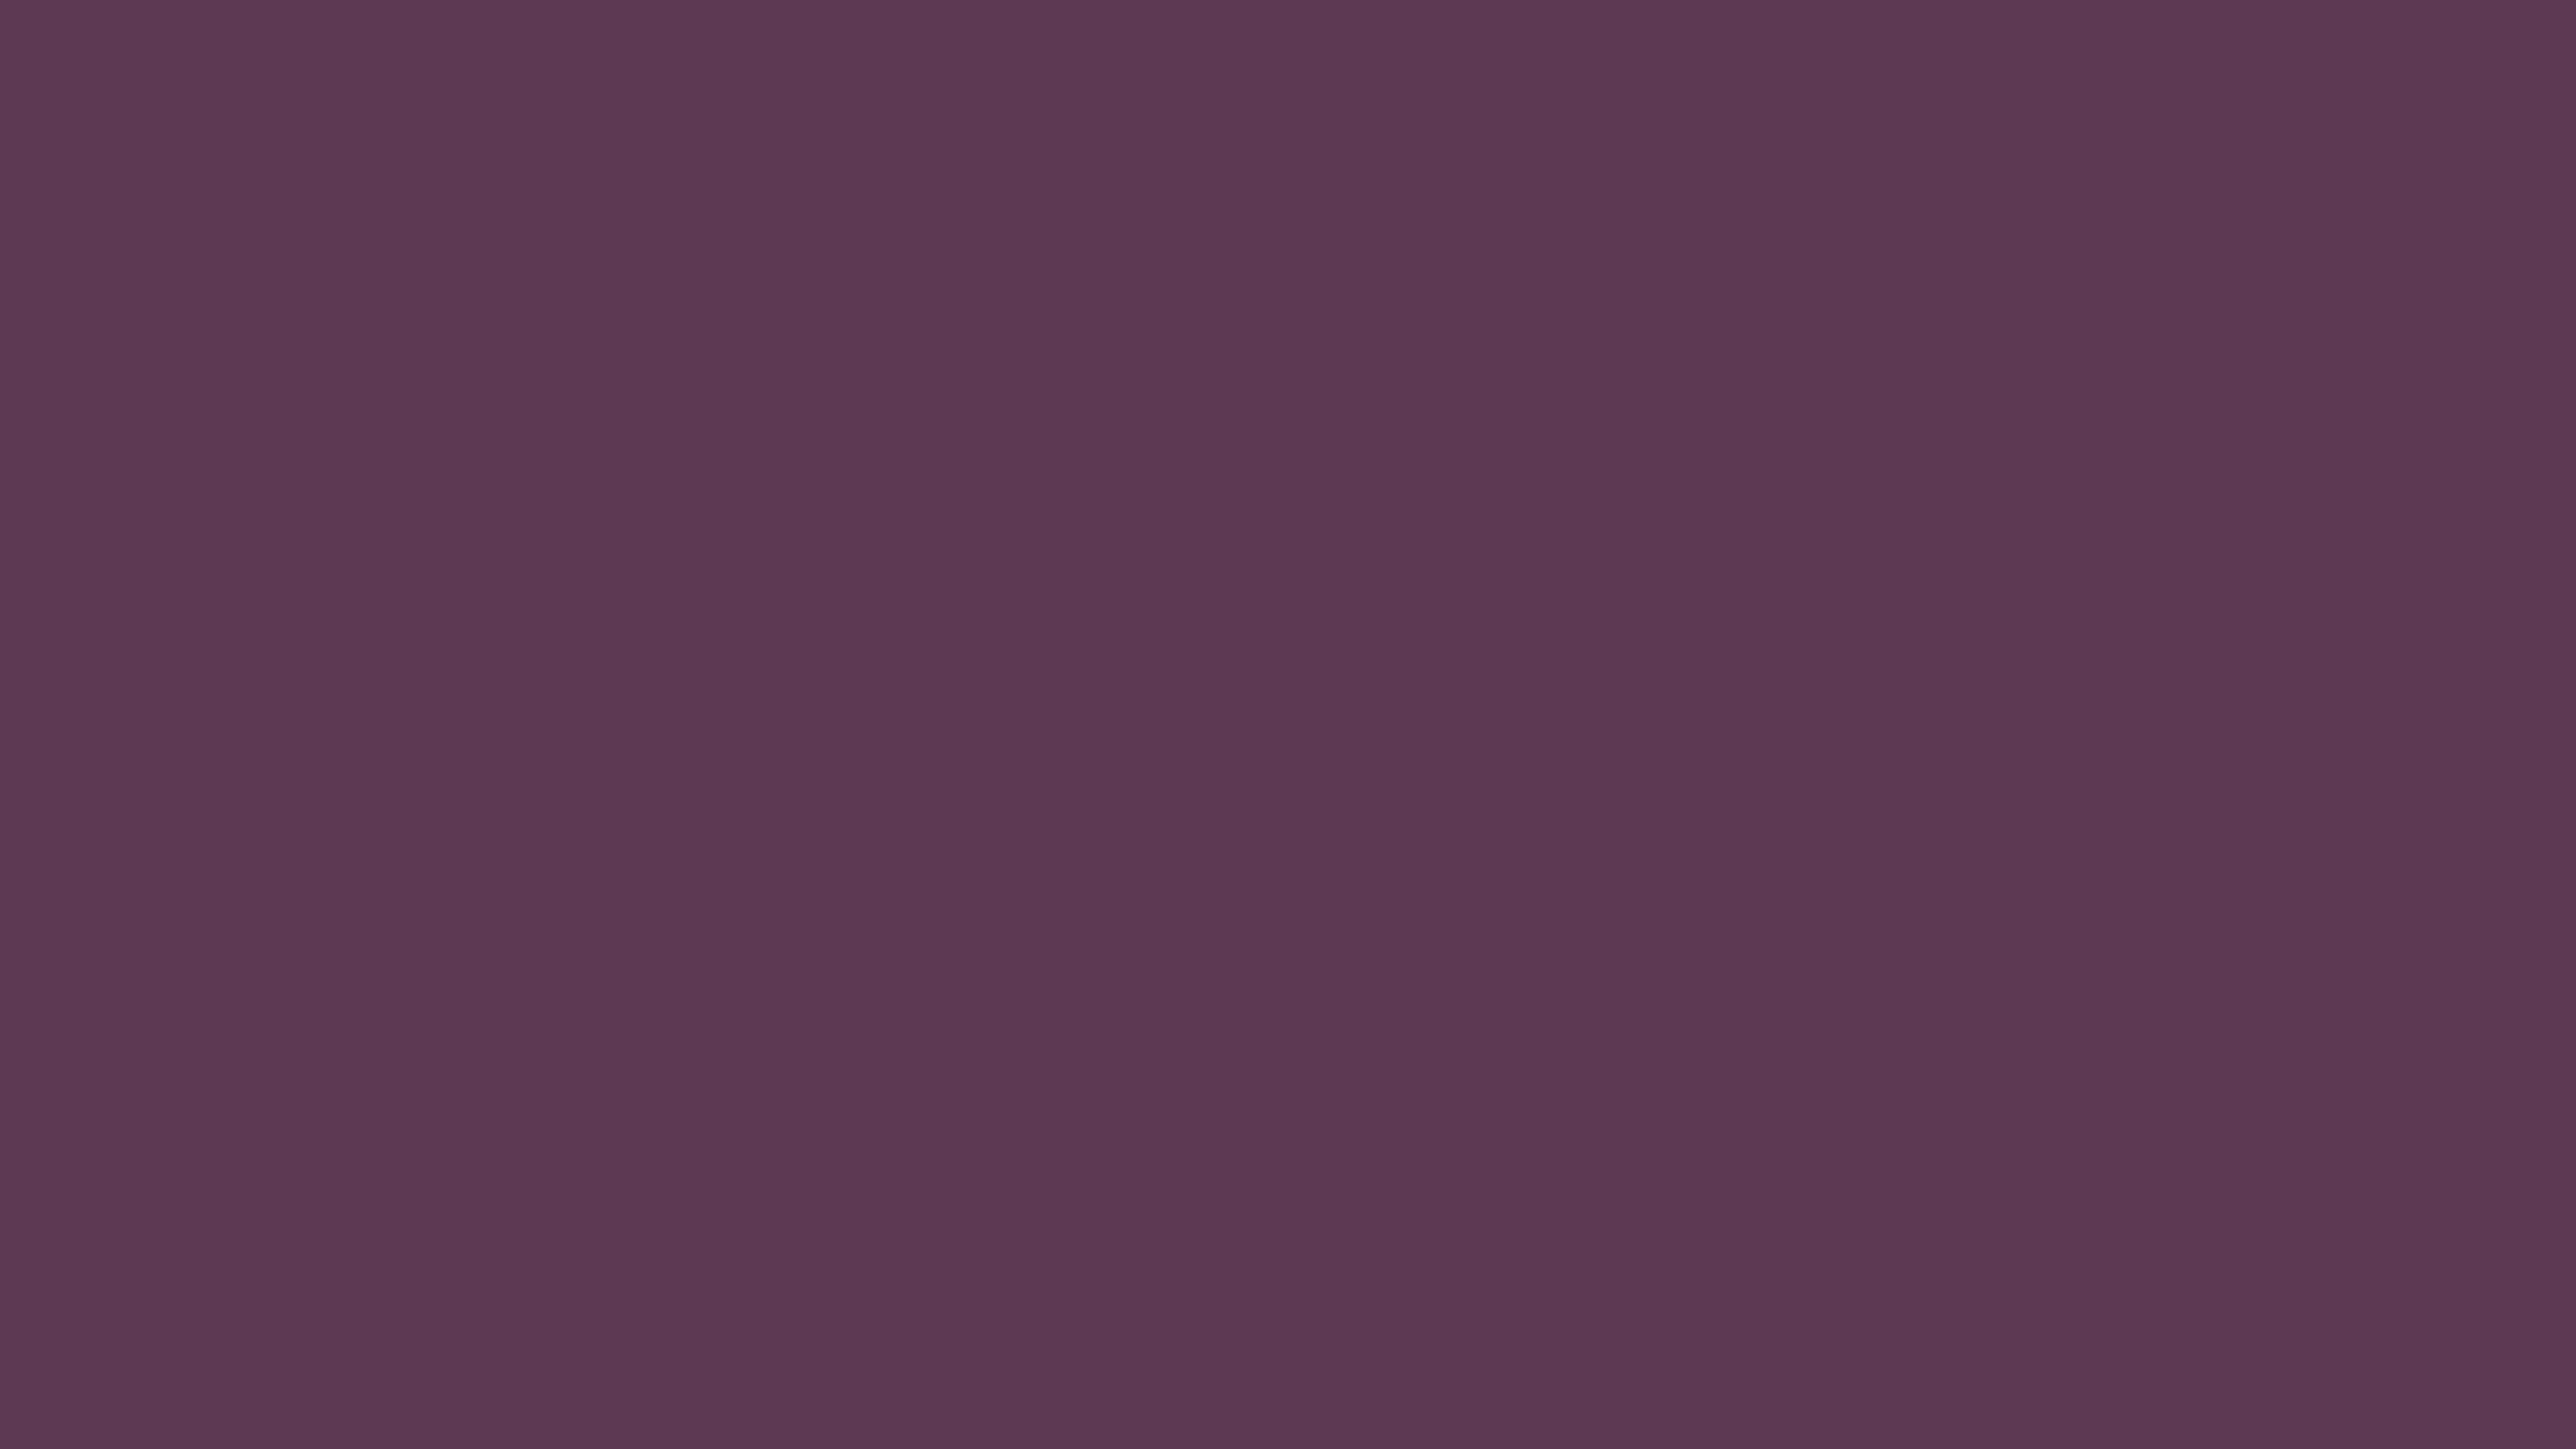 Dark Byzantium Solid Color Background Wallpaper 5120x2880